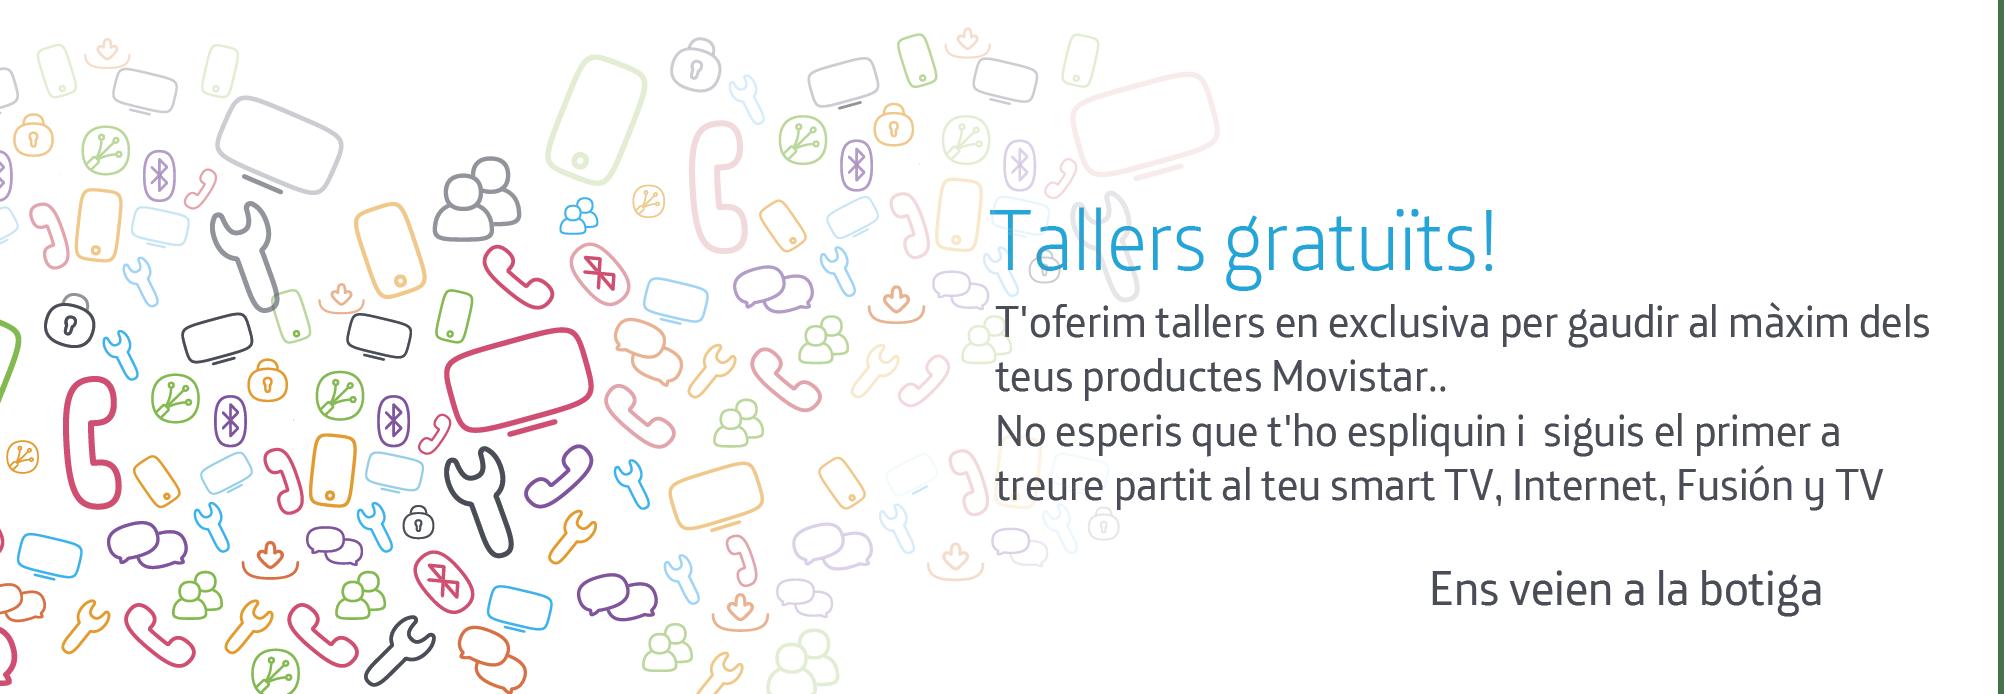 Tallers Fusión Barcelona Gran de Gracia: Apro